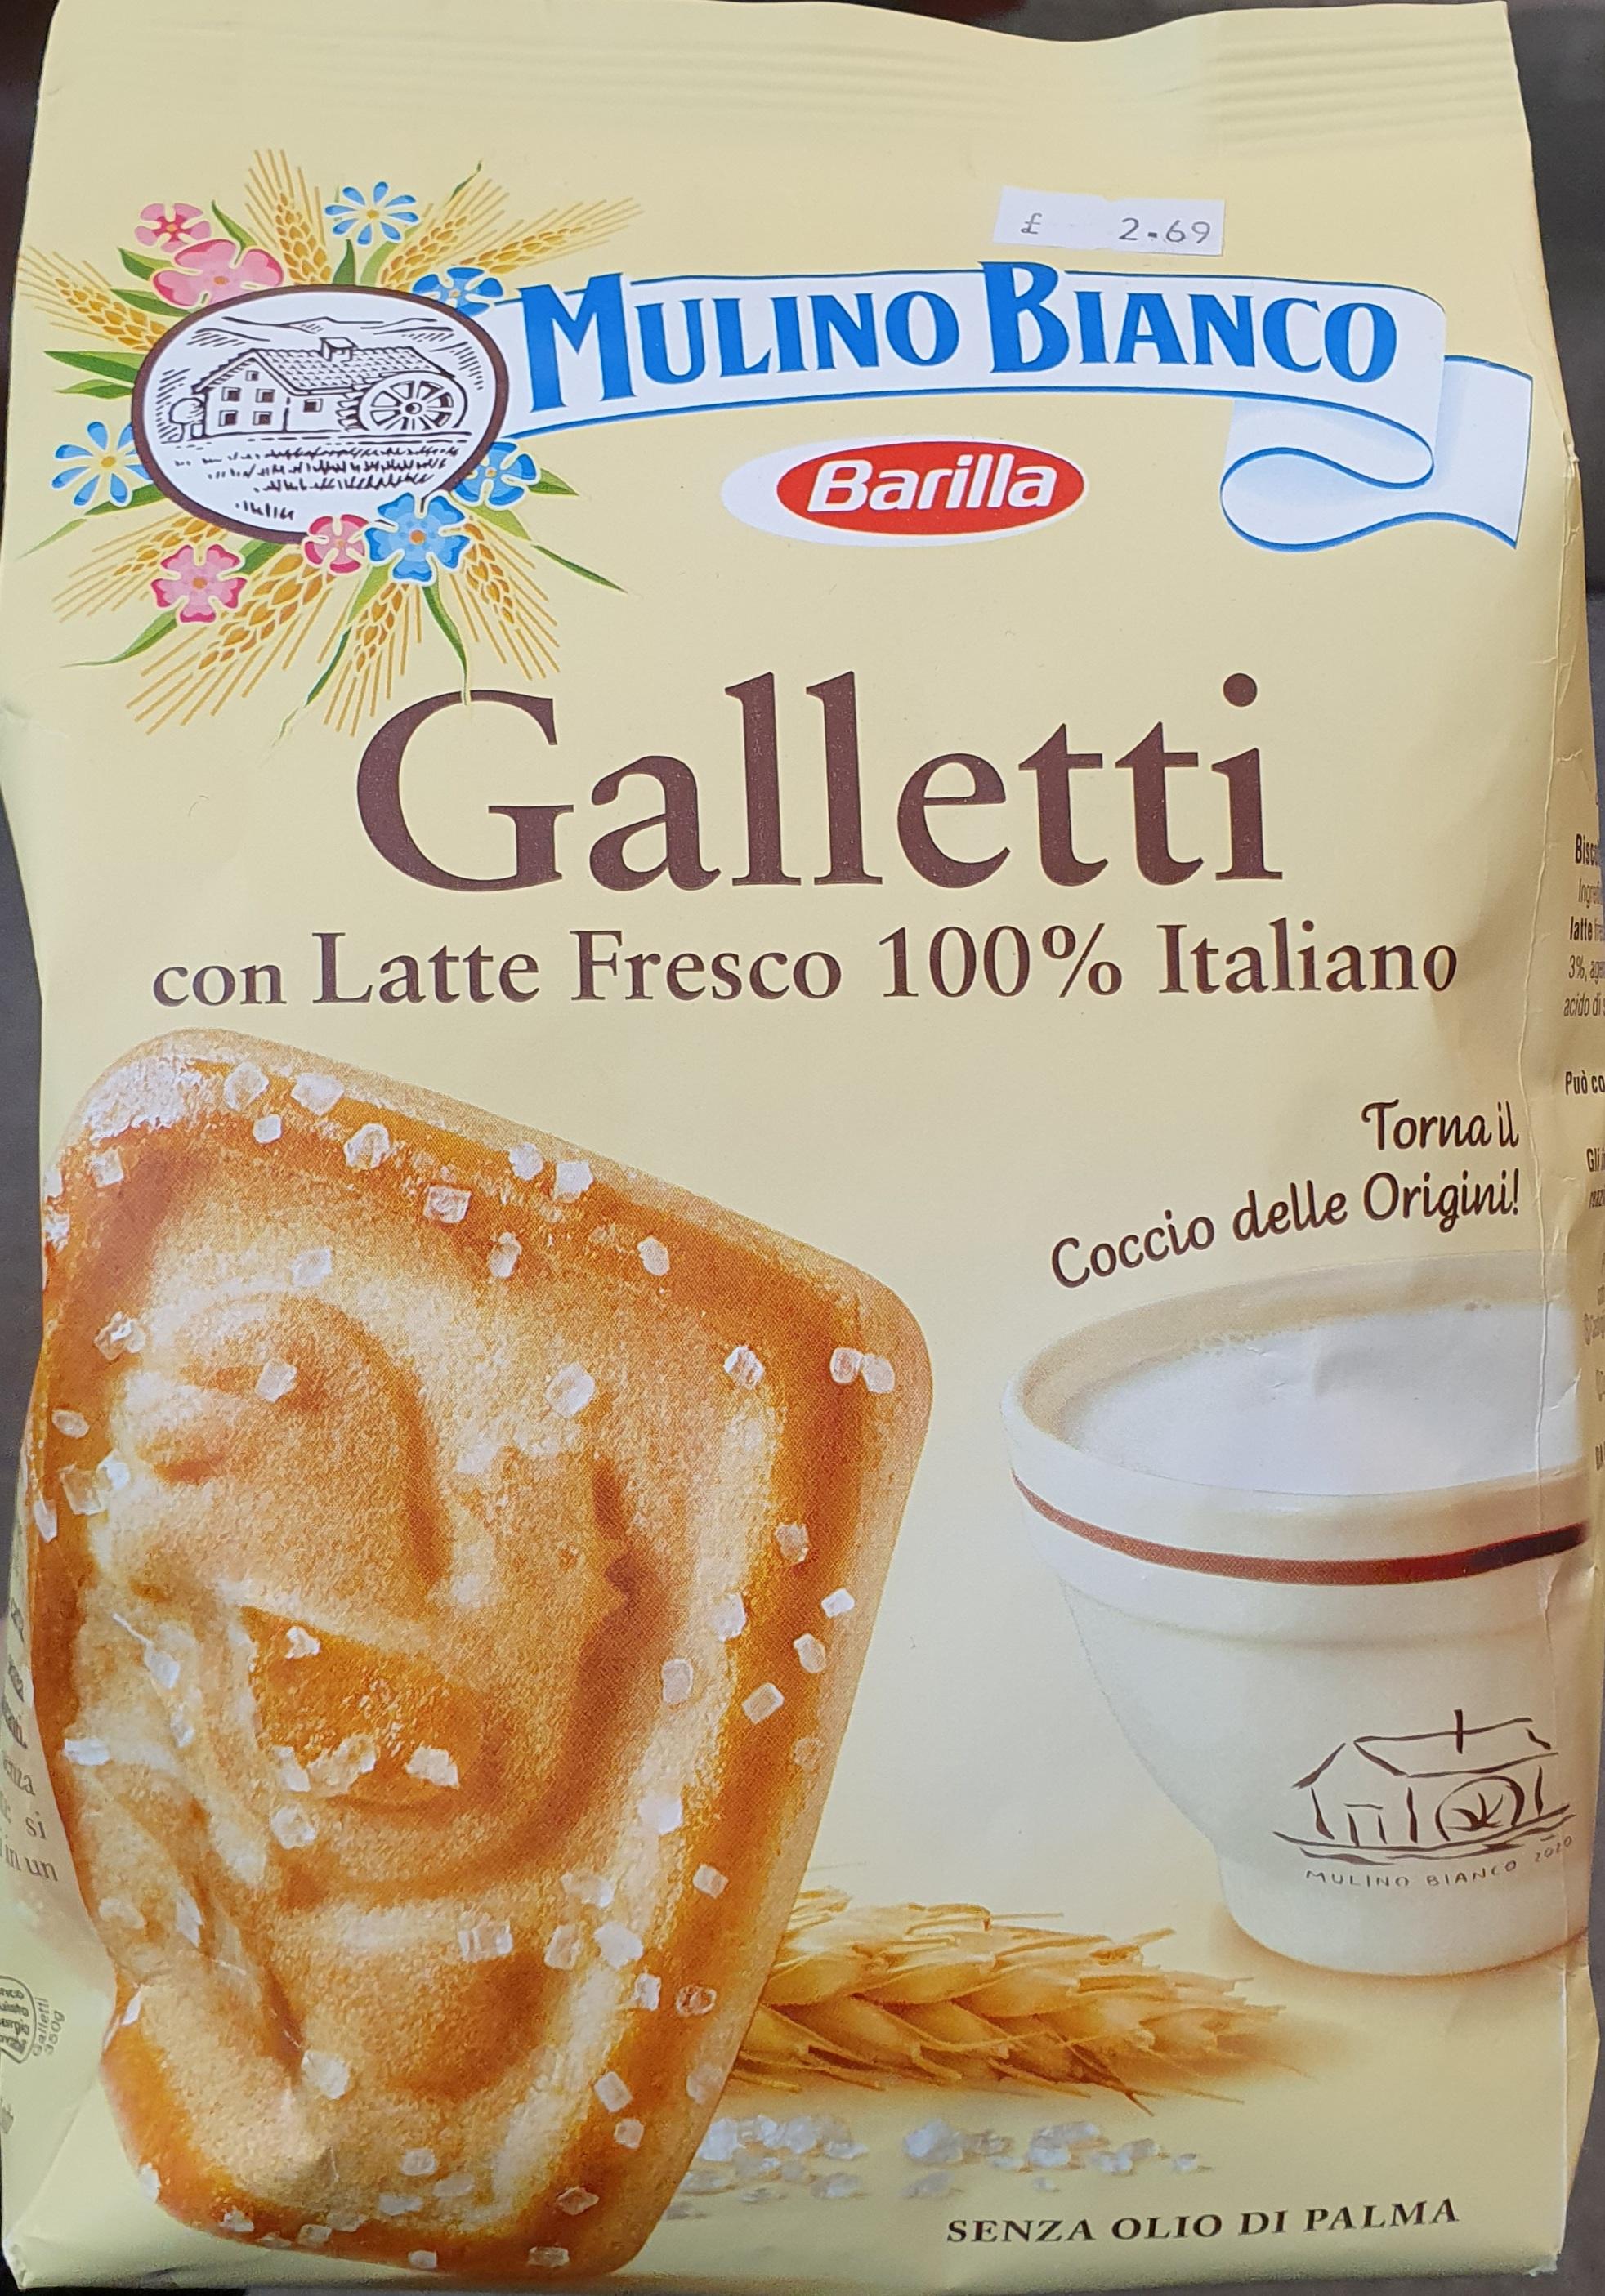 Galletti biscuits by Mulino Bianco 350g